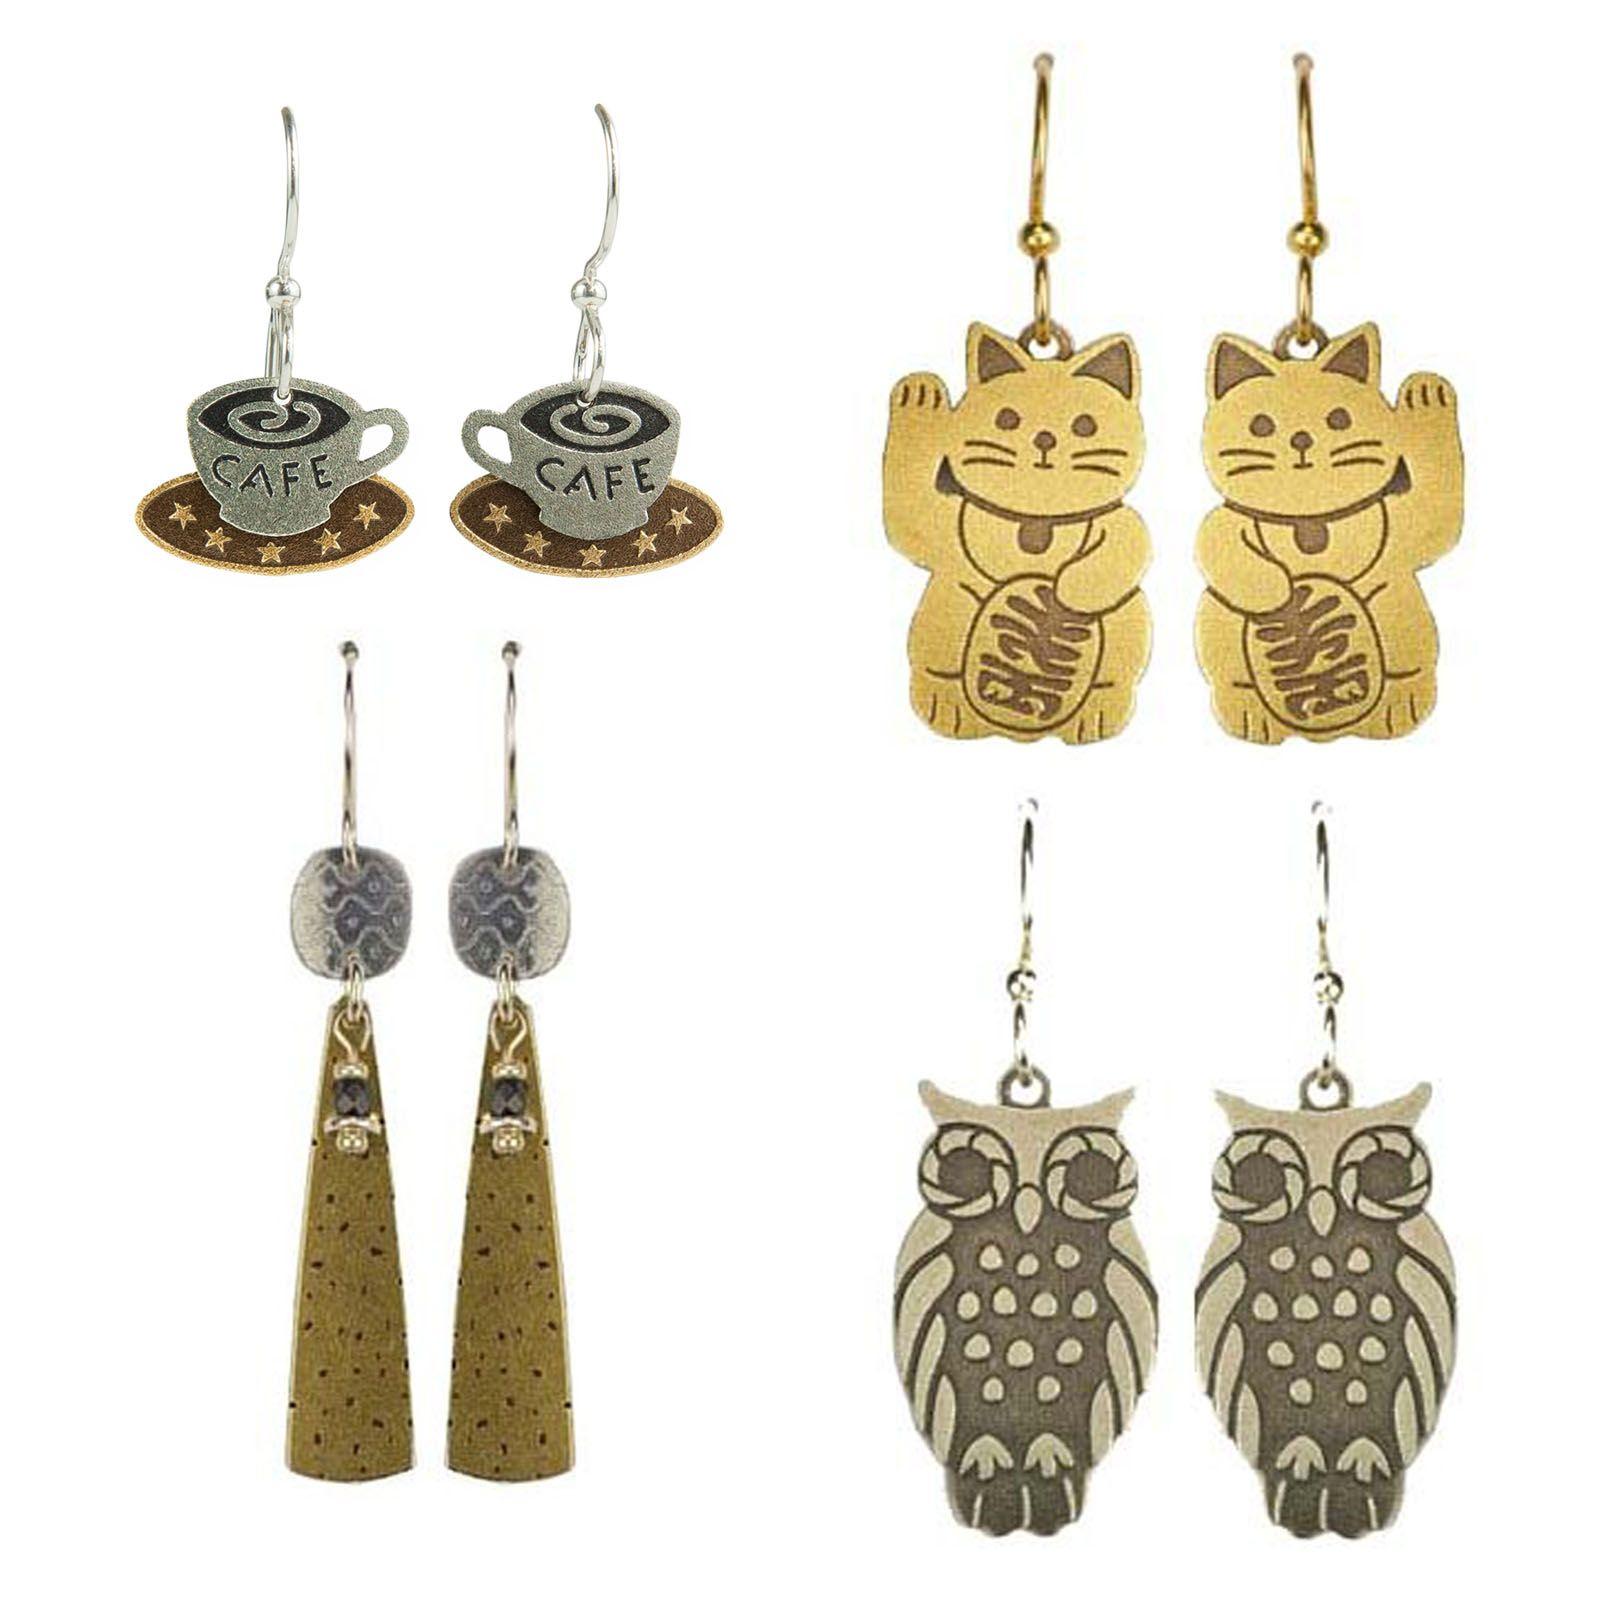 Gold- & Silver-toned Earrings - Joseph Brinton Jewelry | Touchstone Gallery